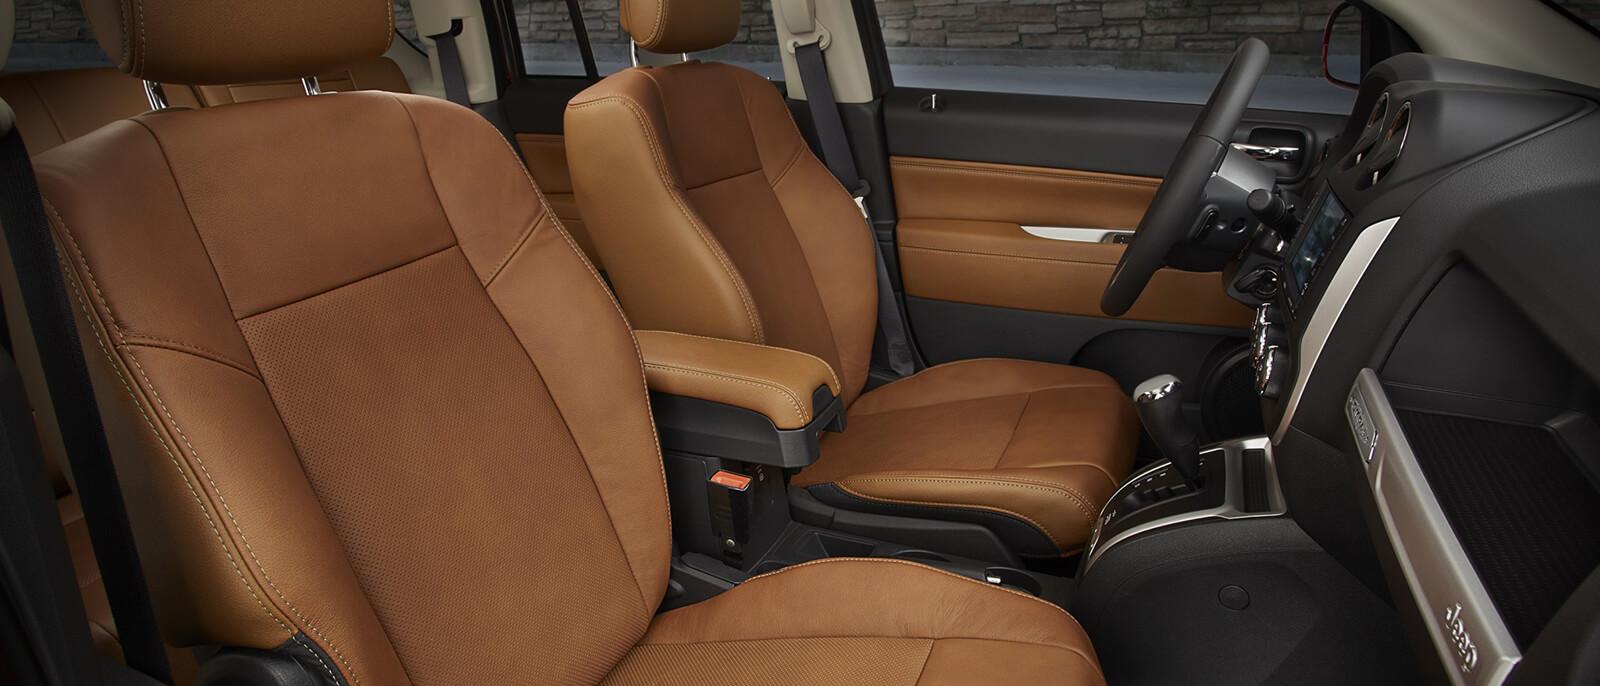 2017 Jeep Compass Interior